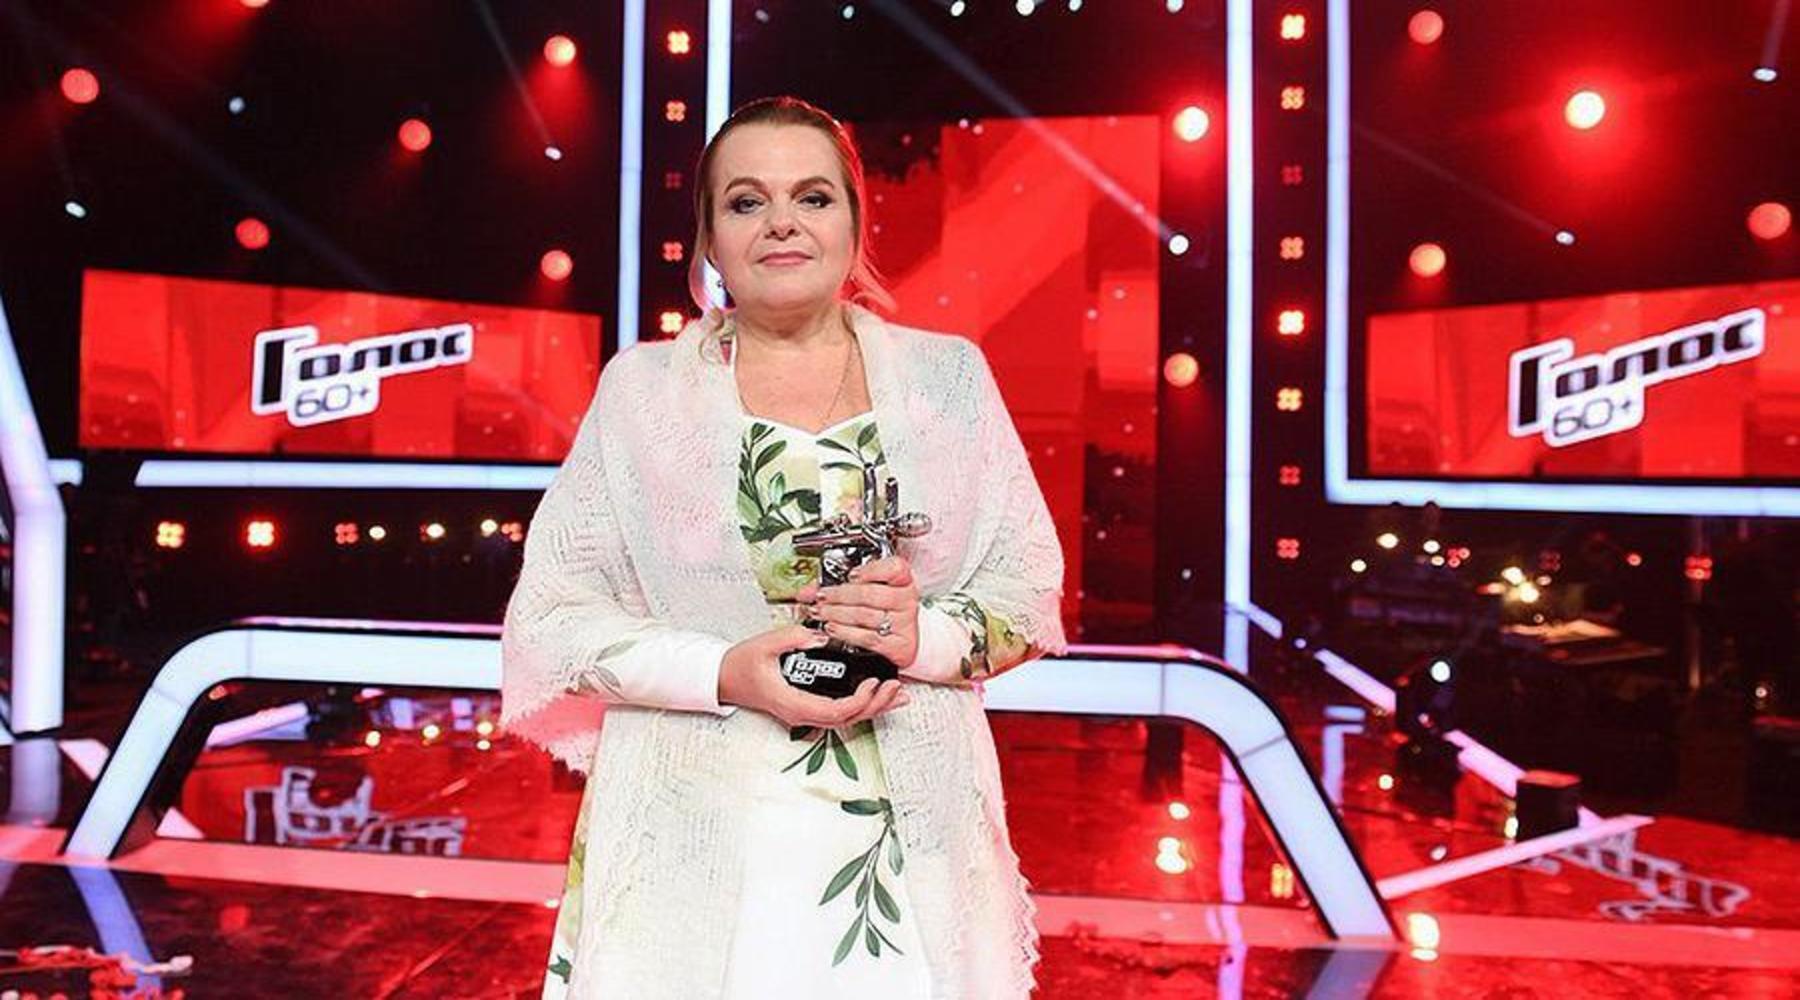 Победителем шоу «Голос 60+» стала Лидия Музалева | Шоу